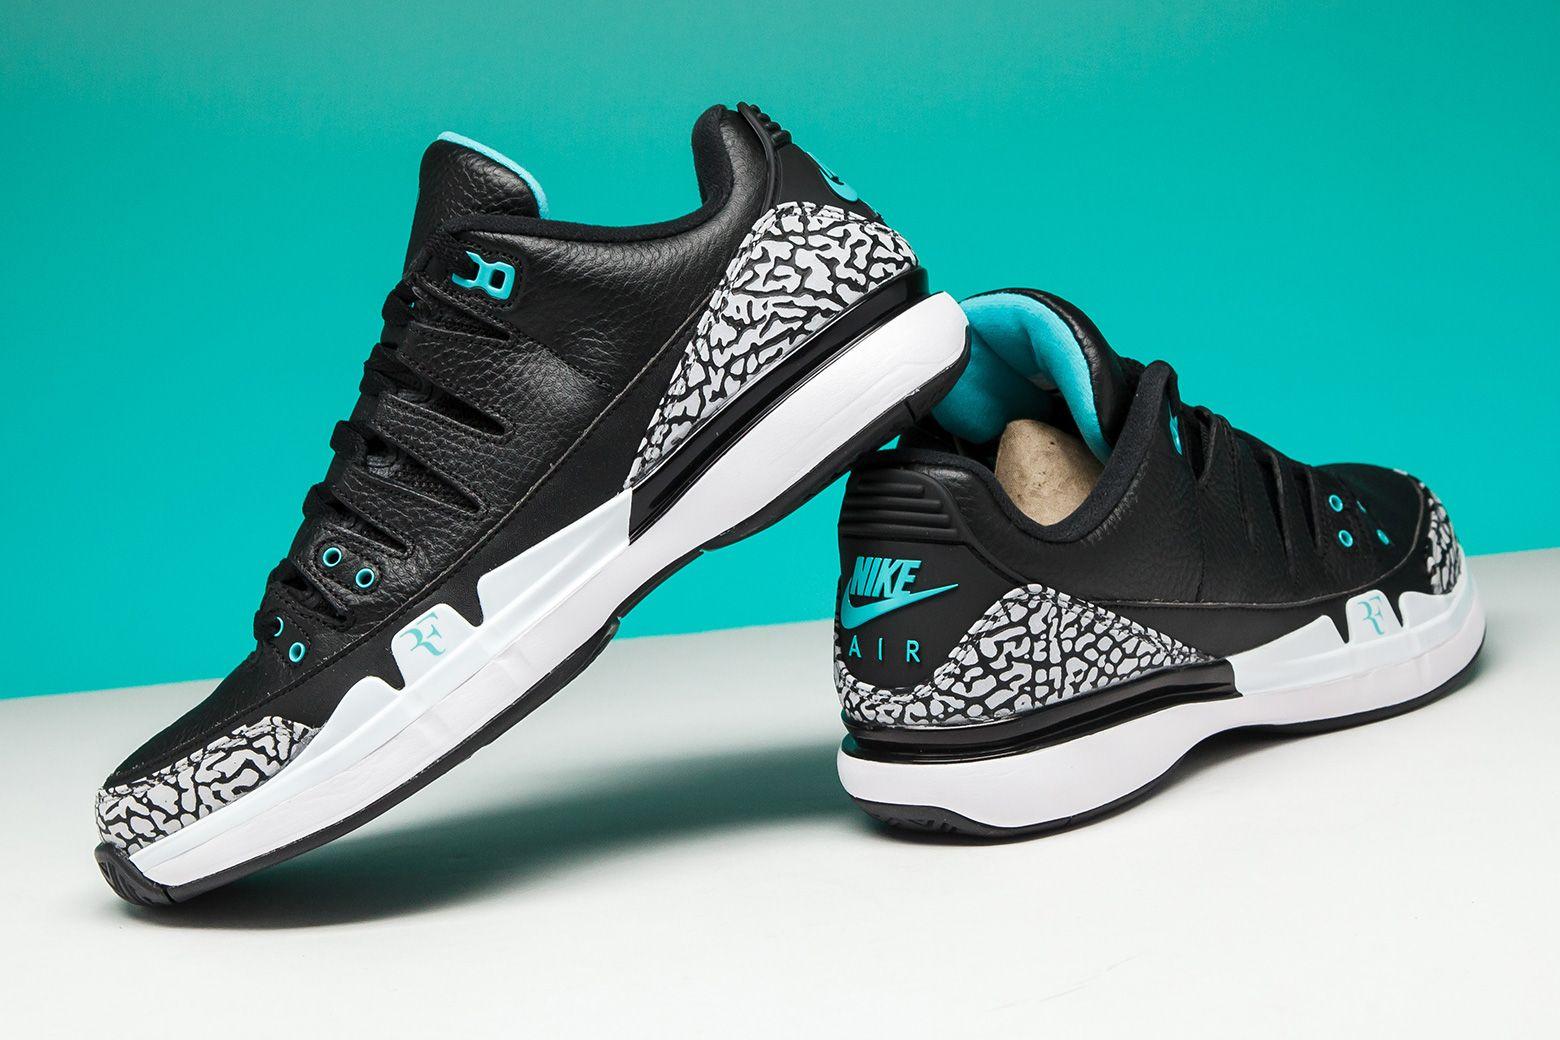 official photos 1e61e 5b6b0 Nike Zoom Vapor RF X AJ3 - 709998 031   Cool Tenni's   Nike ...